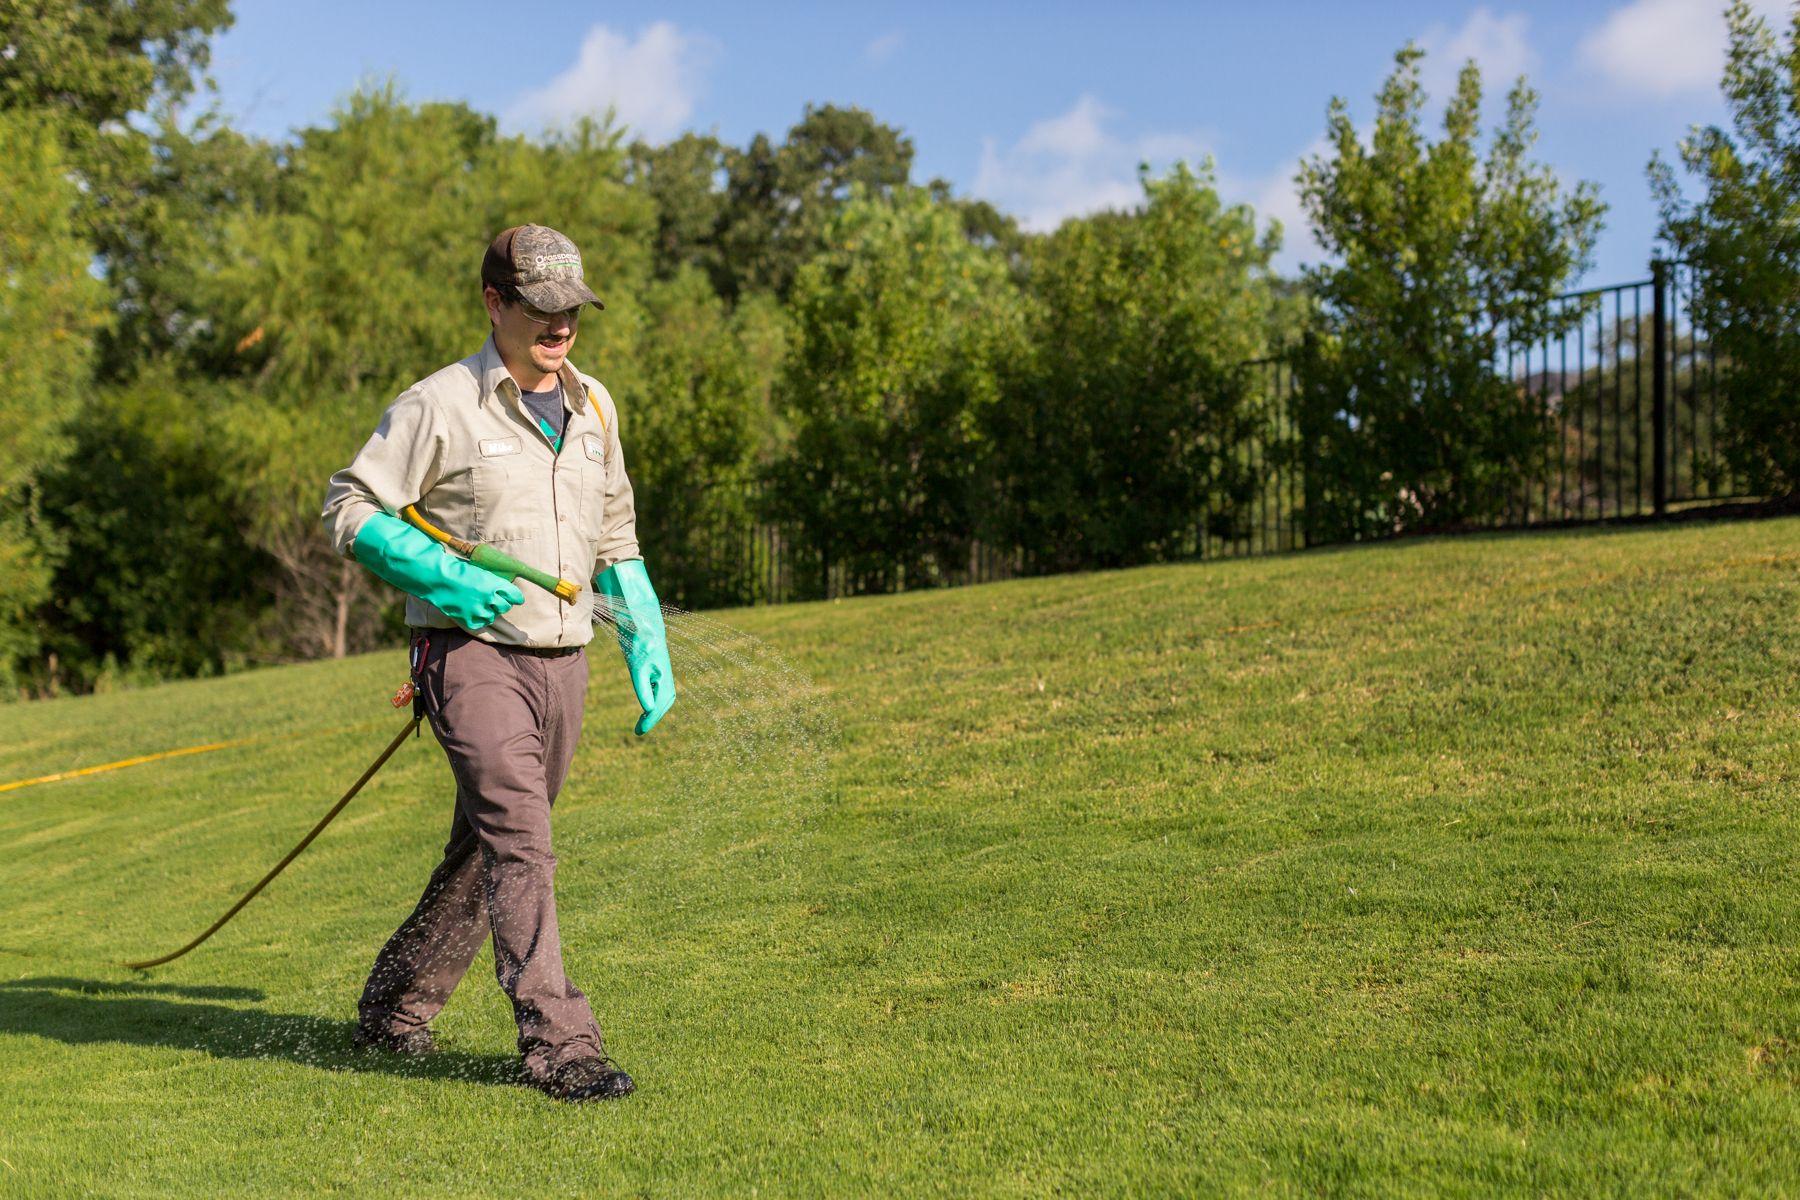 lawn care technician spraying a lawn